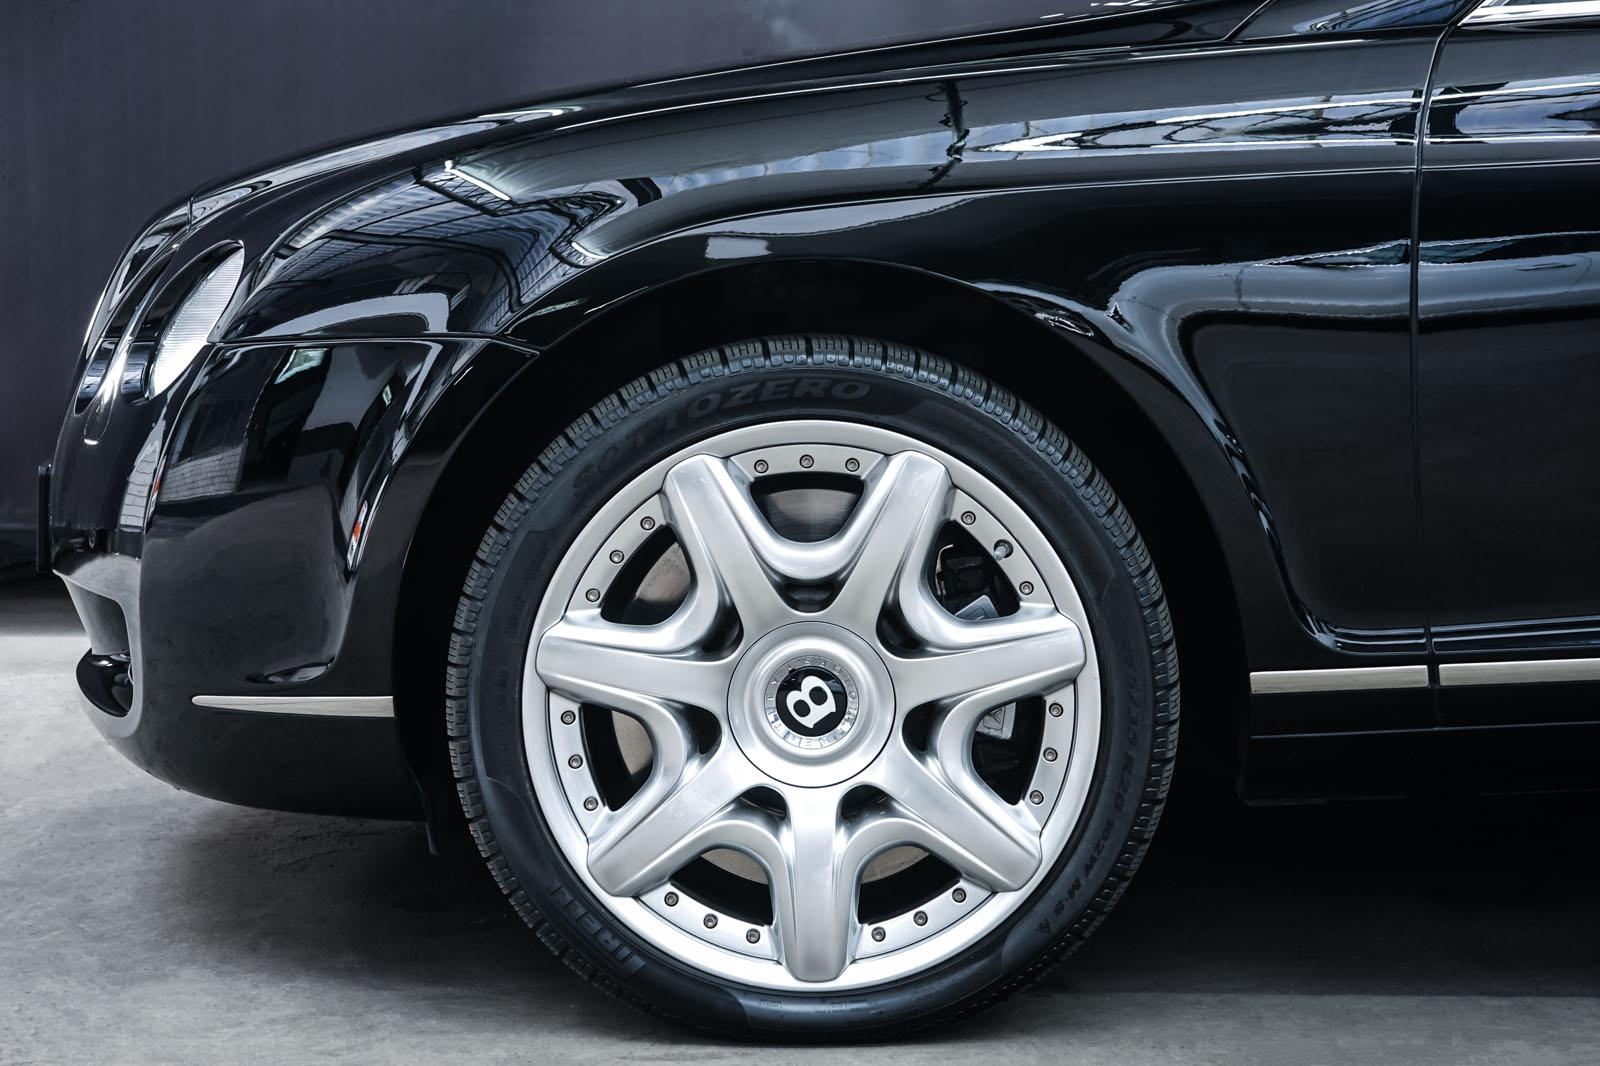 Bentley_Continental_GT_Schwarz_Beige_BEN-1159_3_w